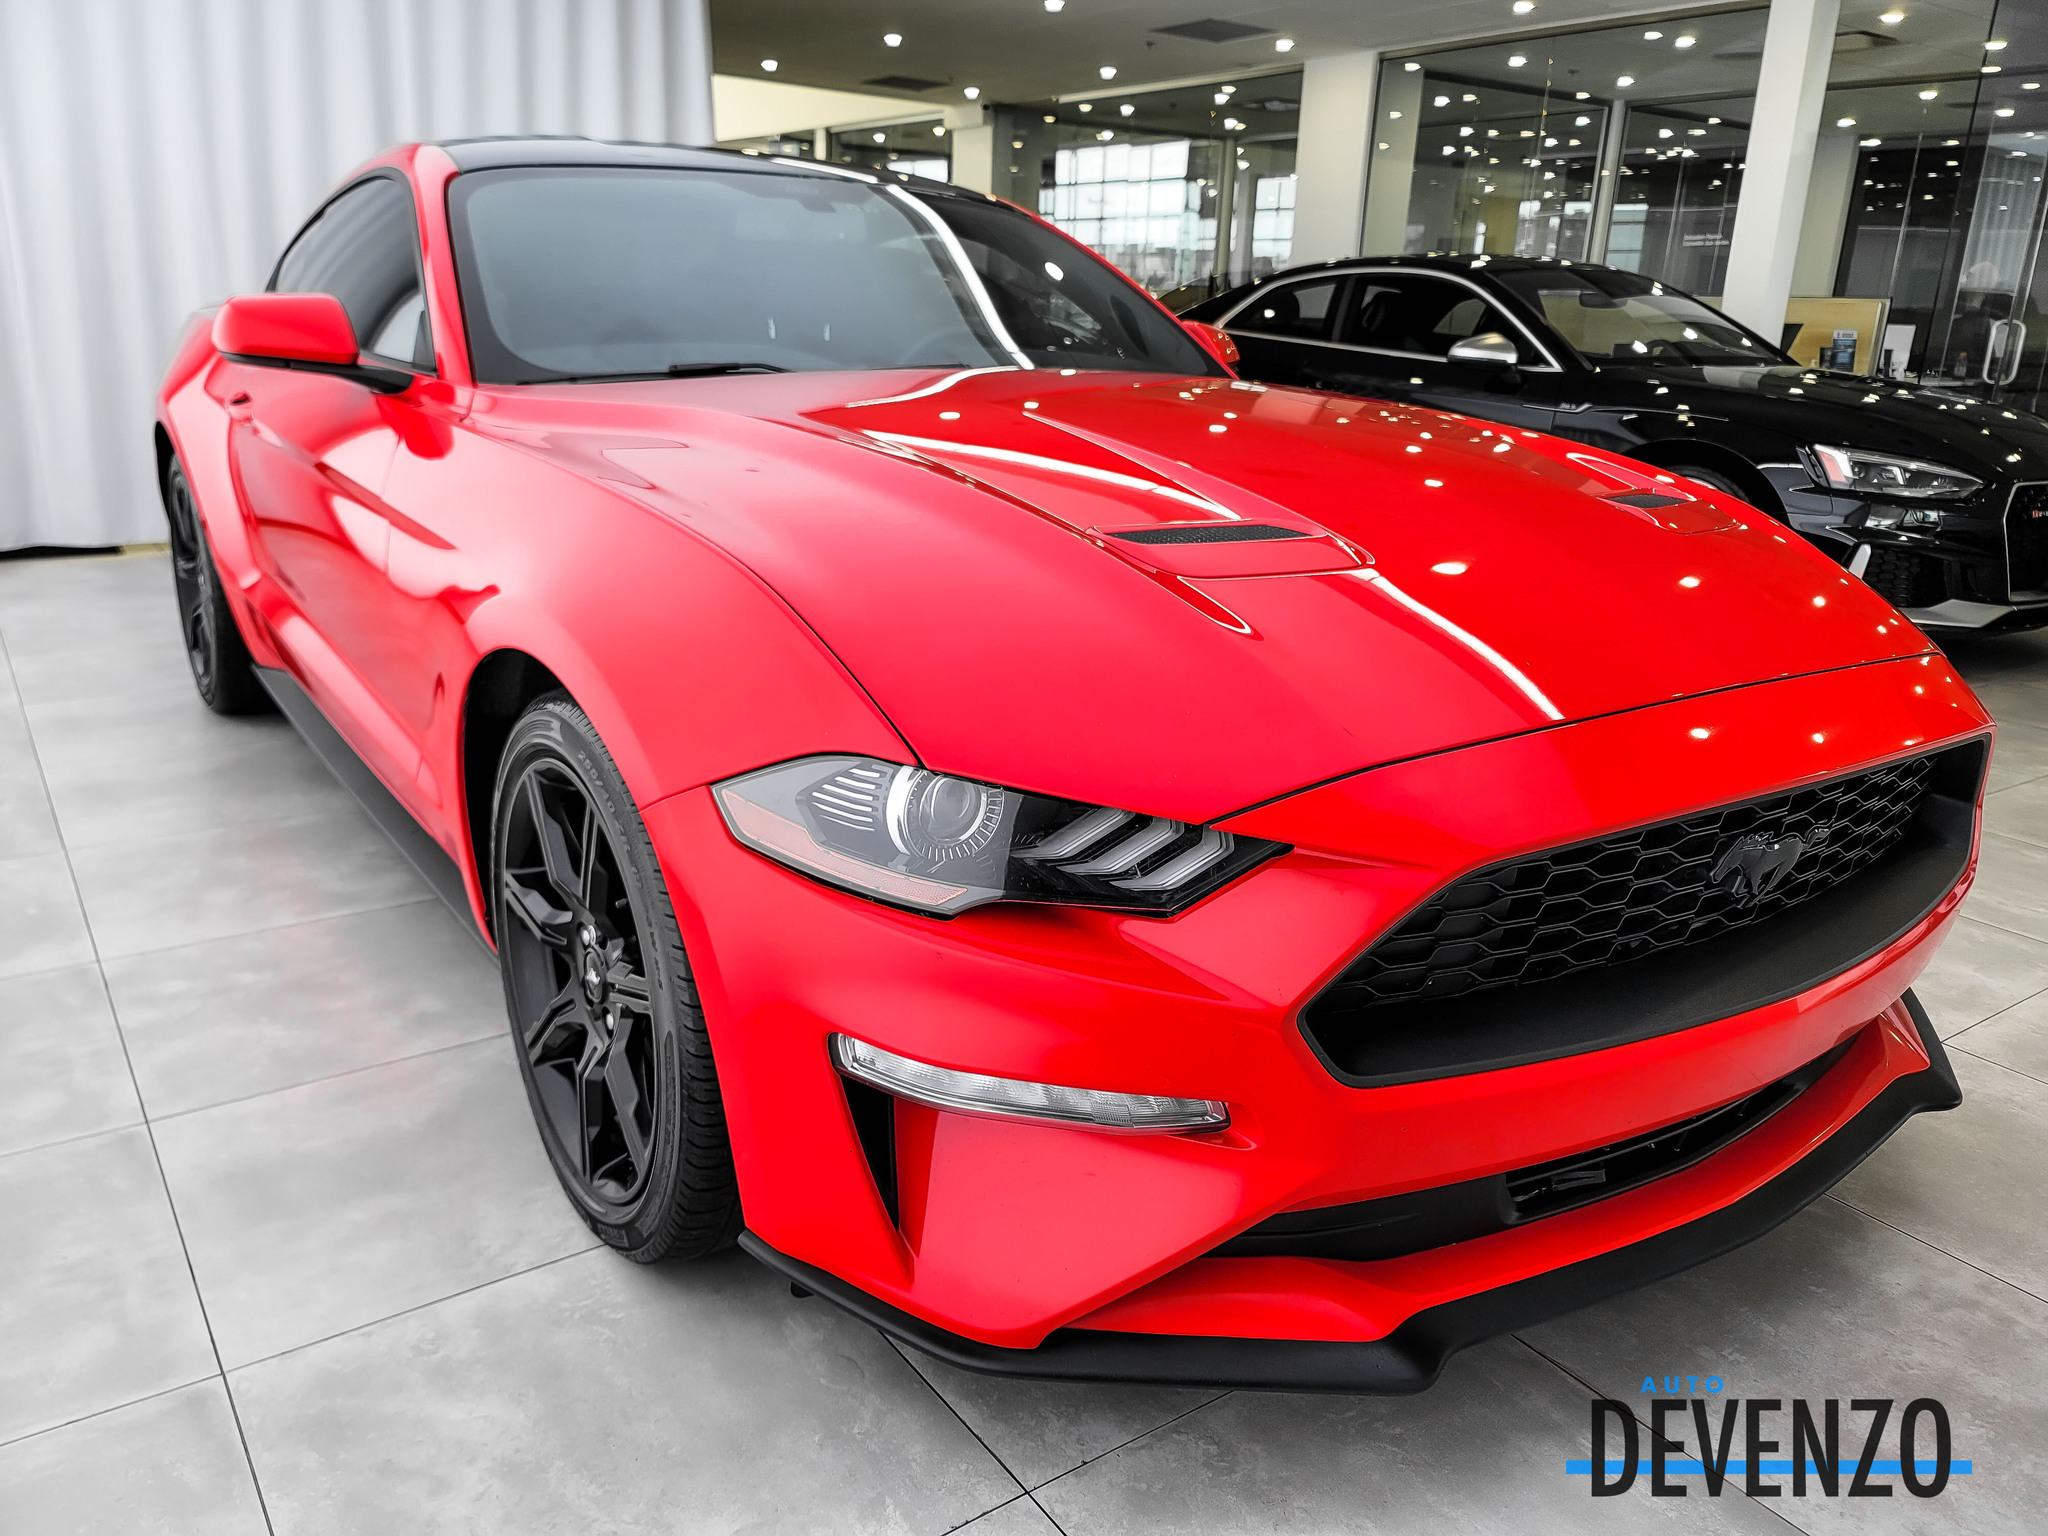 2018 Ford Mustang EcoBoost Fastback Exhaust Magnaflow Black Pack complet